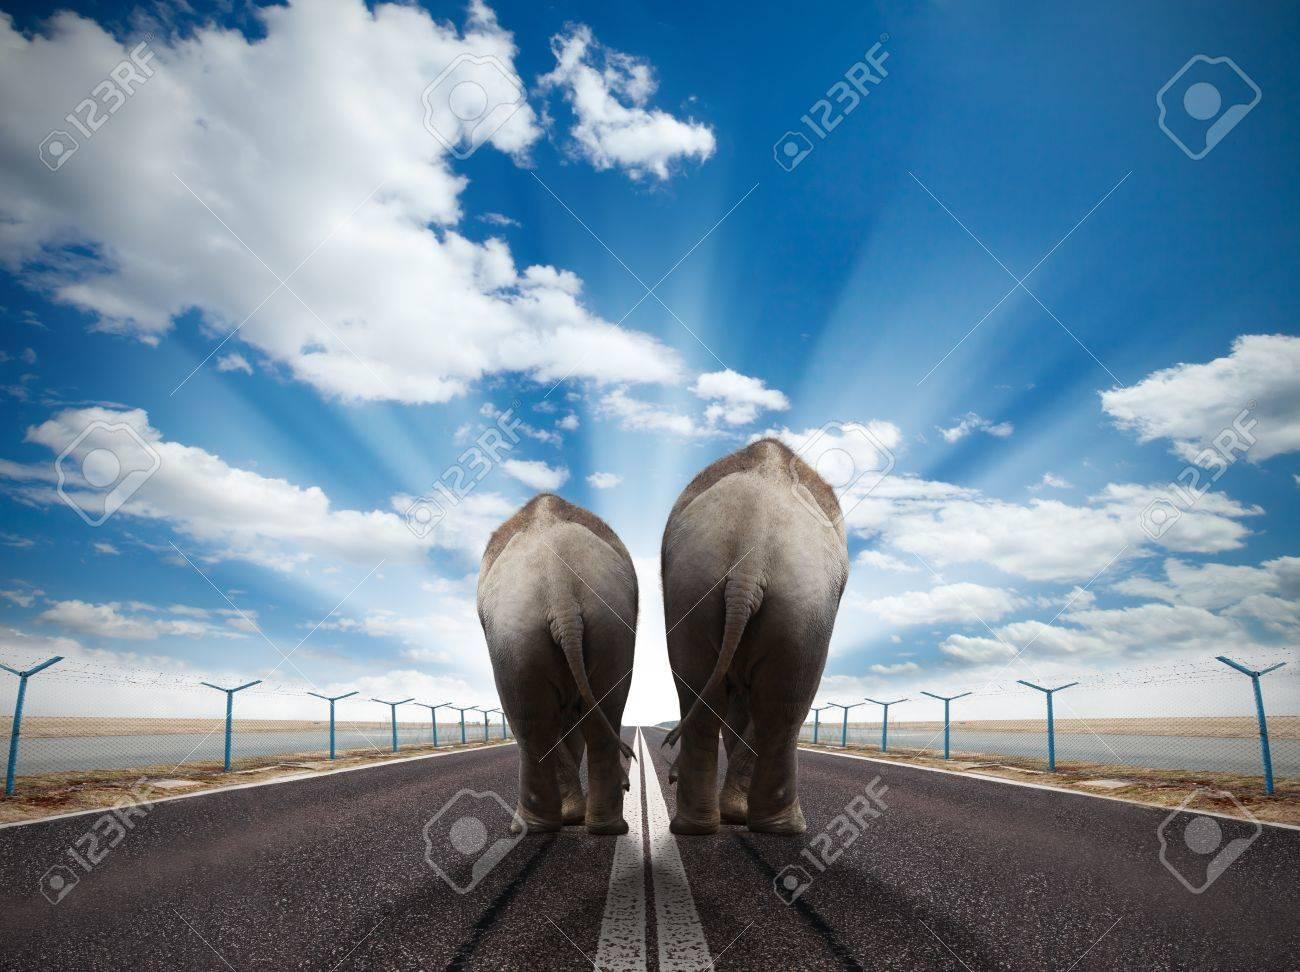 Two elephants walking on runway with sunny sky Stock Photo - 14442665